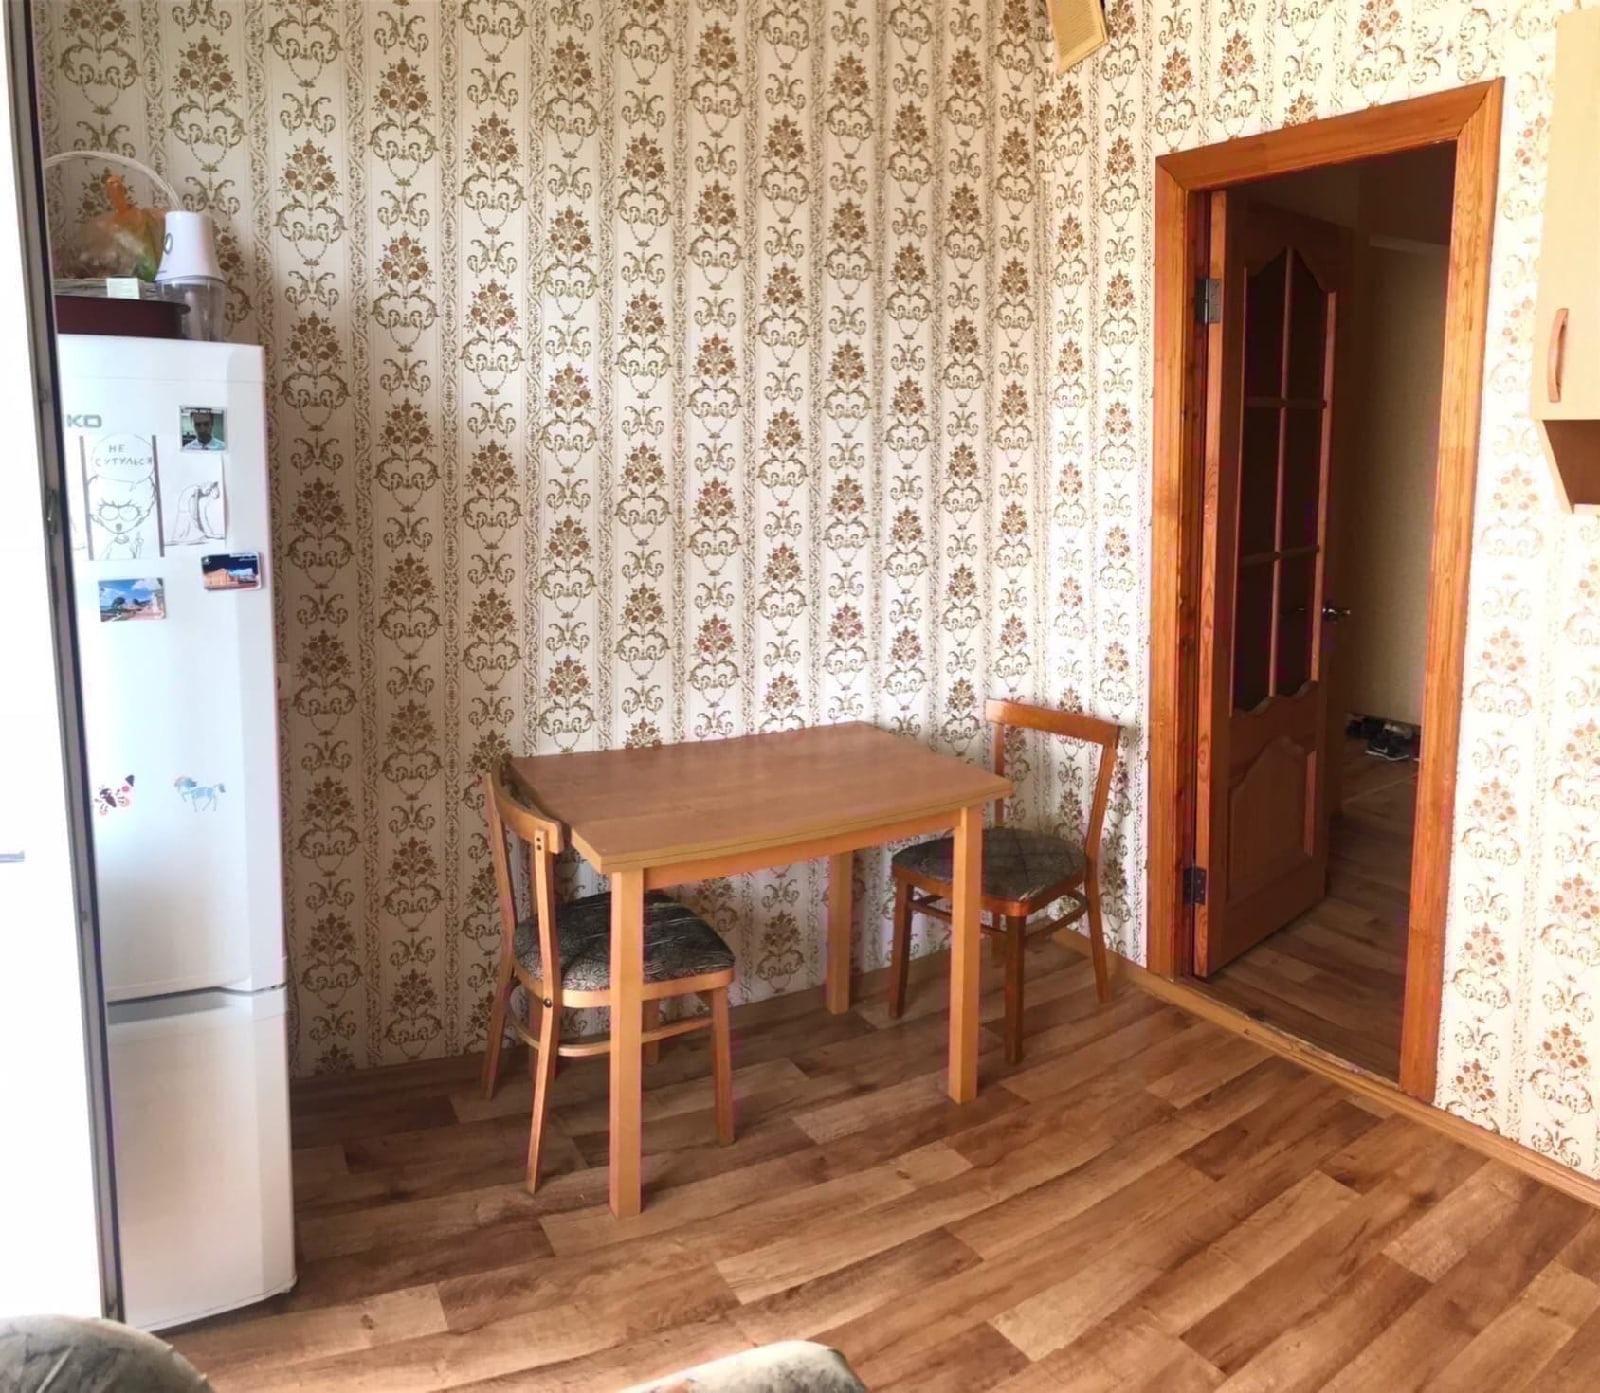 1к квартира Светлогорская улица, 23 | 11000 | аренда в Красноярске фото 3